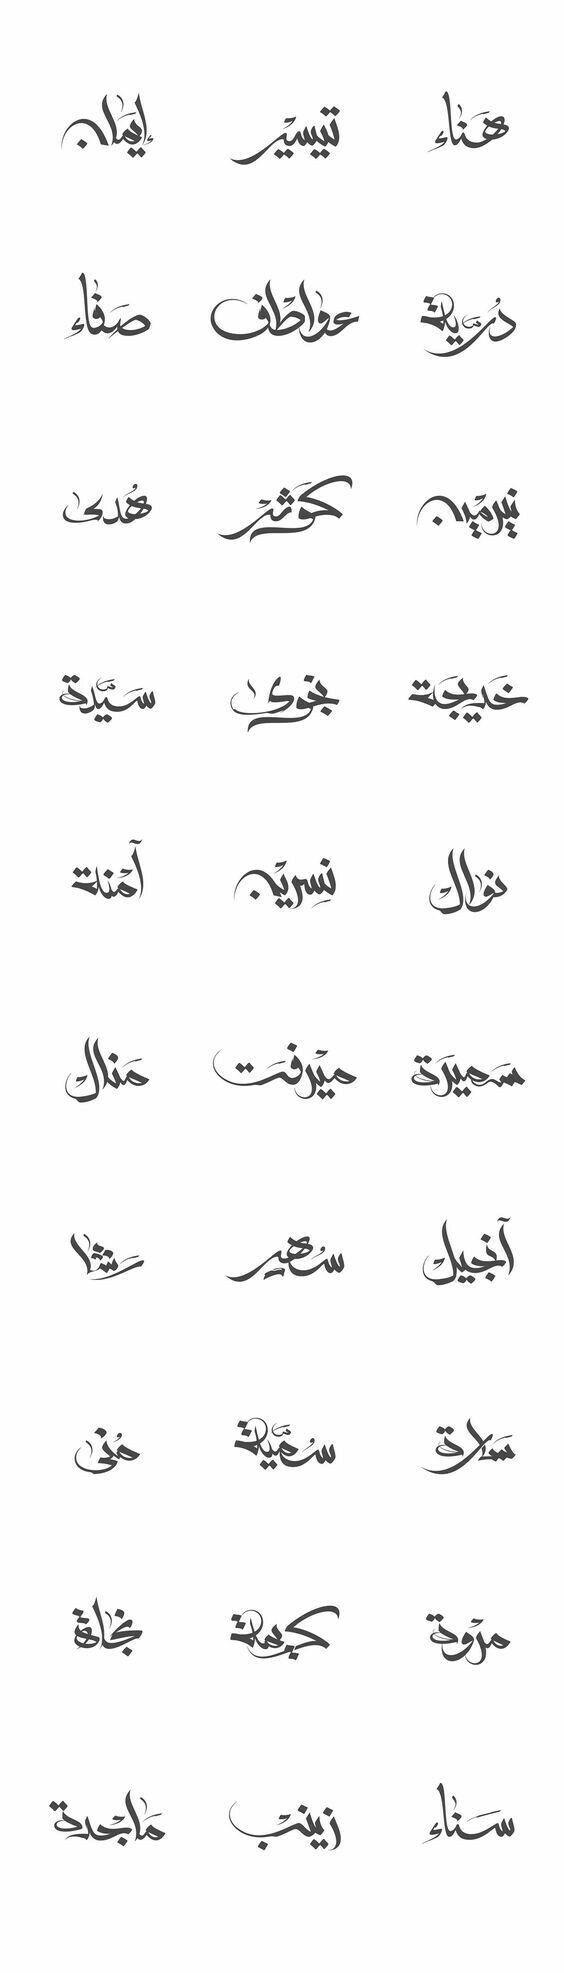 Pin By المصممھہہ منار On منوعات Calligraphy Tattoo Arabic Calligraphy Tattoo Arabic Calligraphy Art